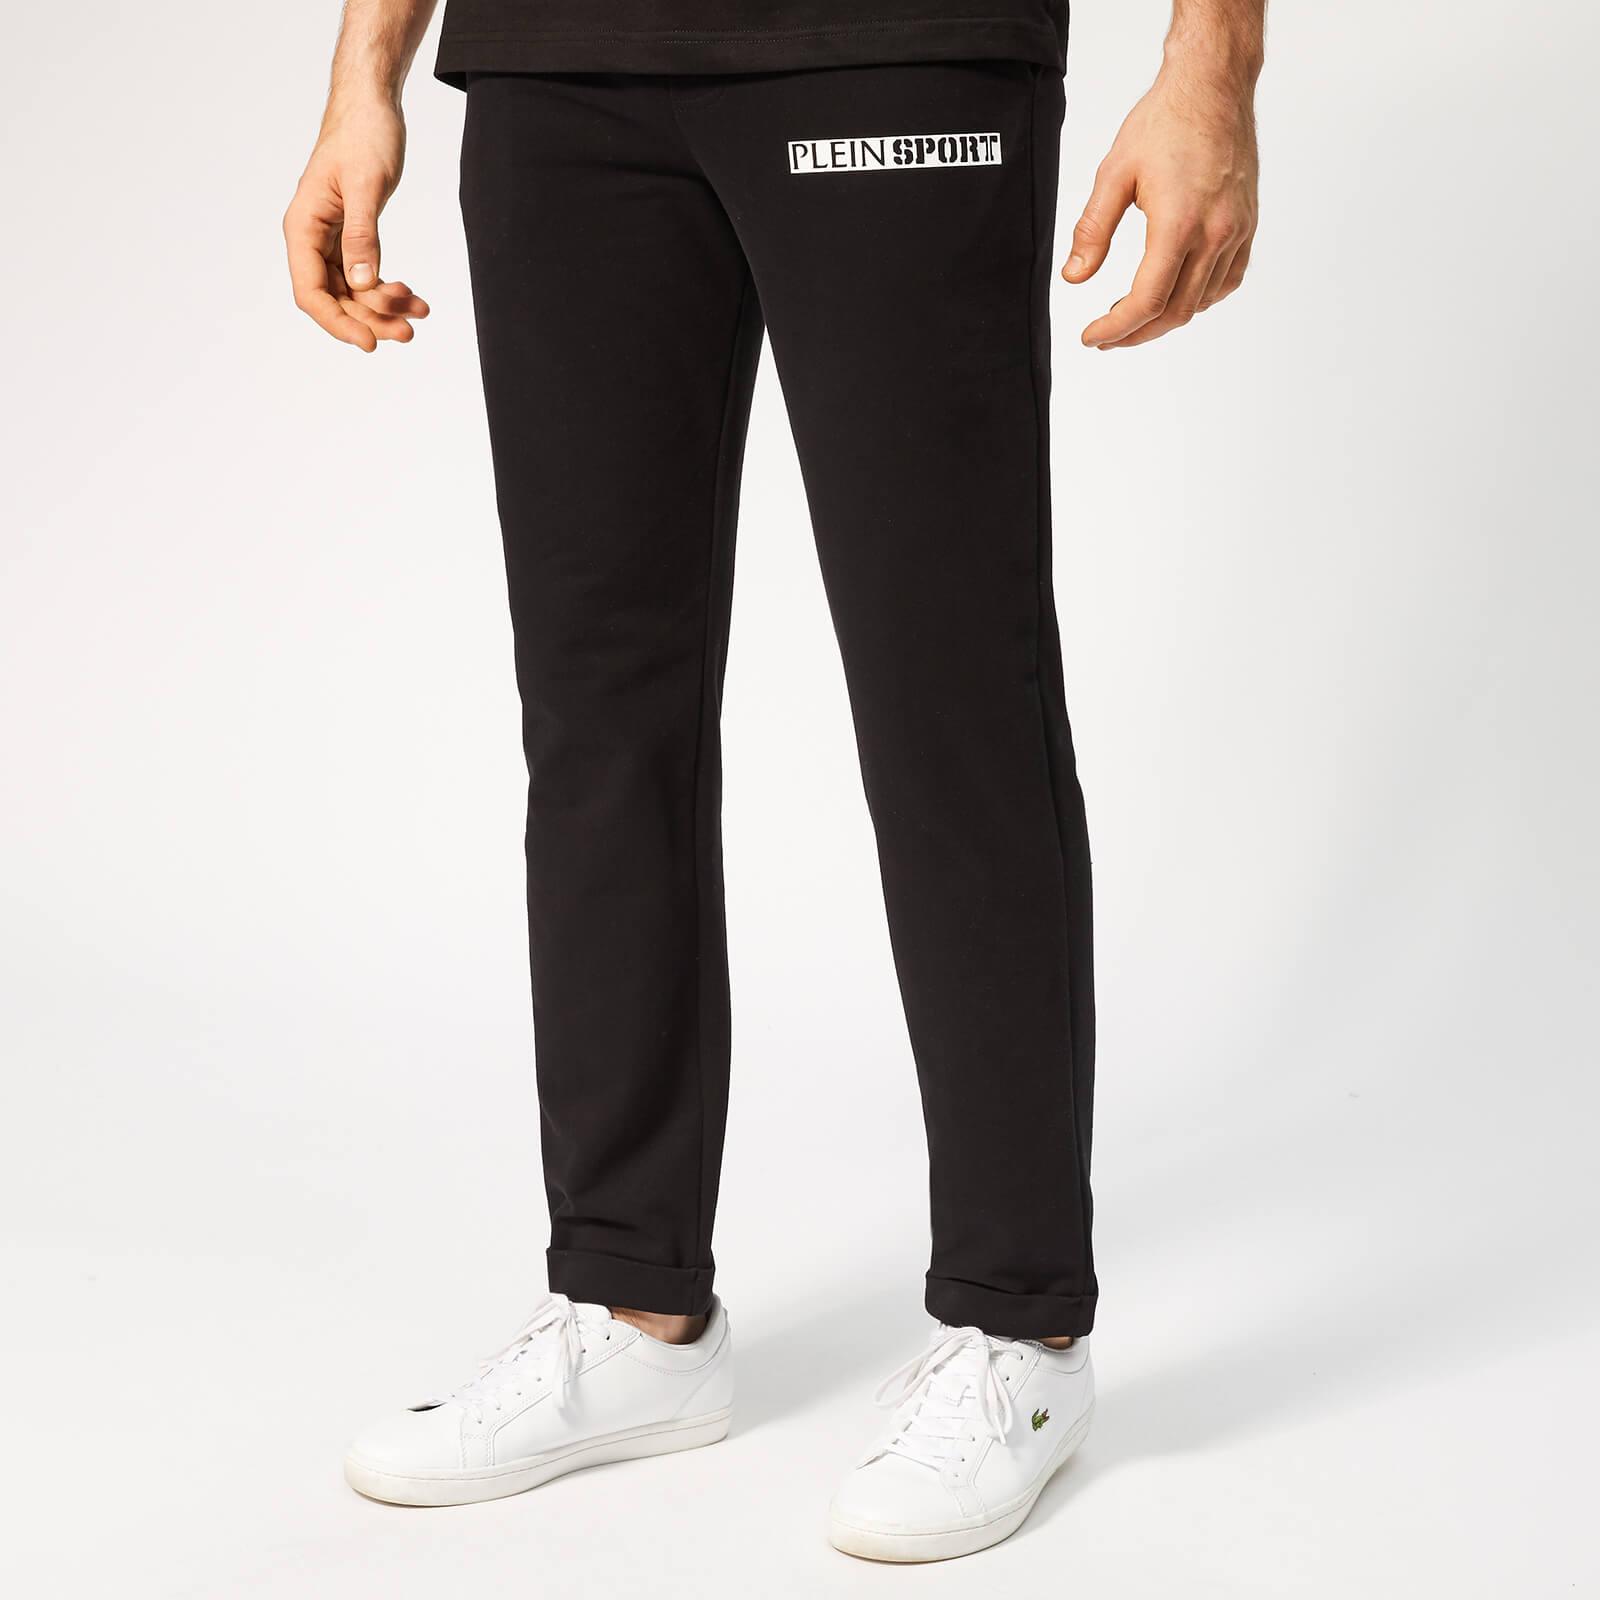 Plein Sport Men's Statement Jogging Trousers - Black - XL - Black